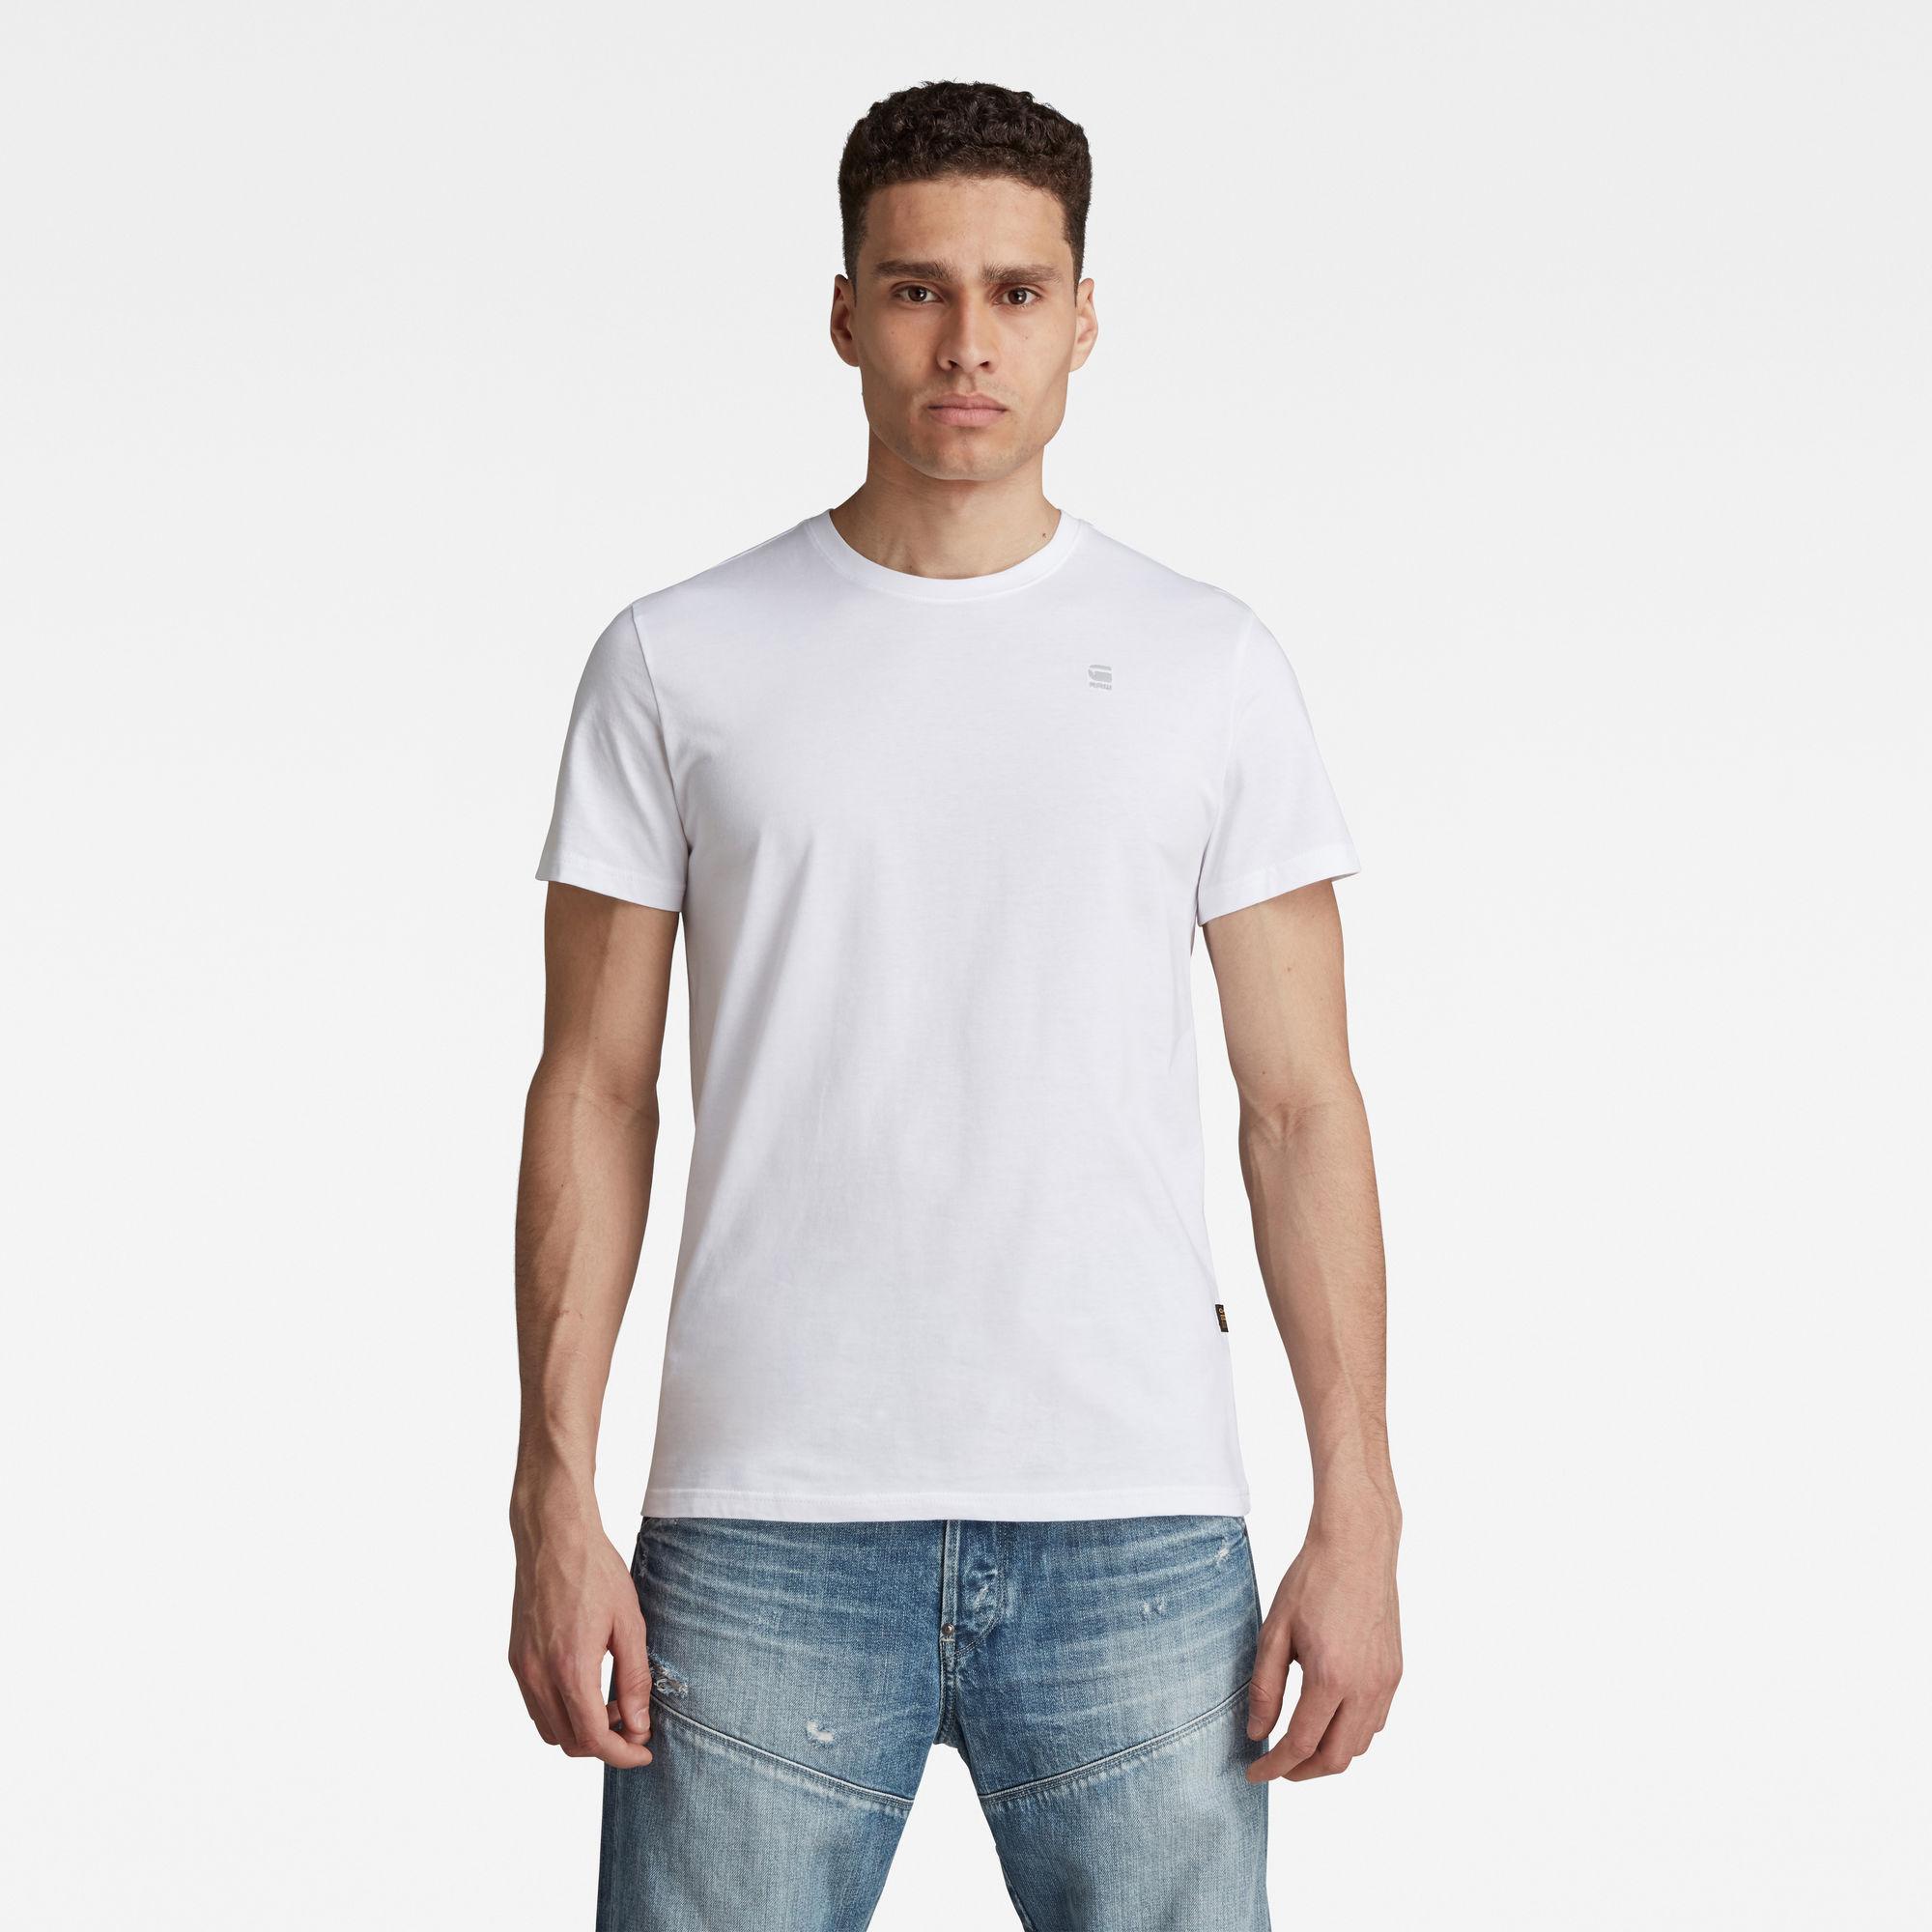 G-Star RAW Heren Base-S T-Shirt Wit